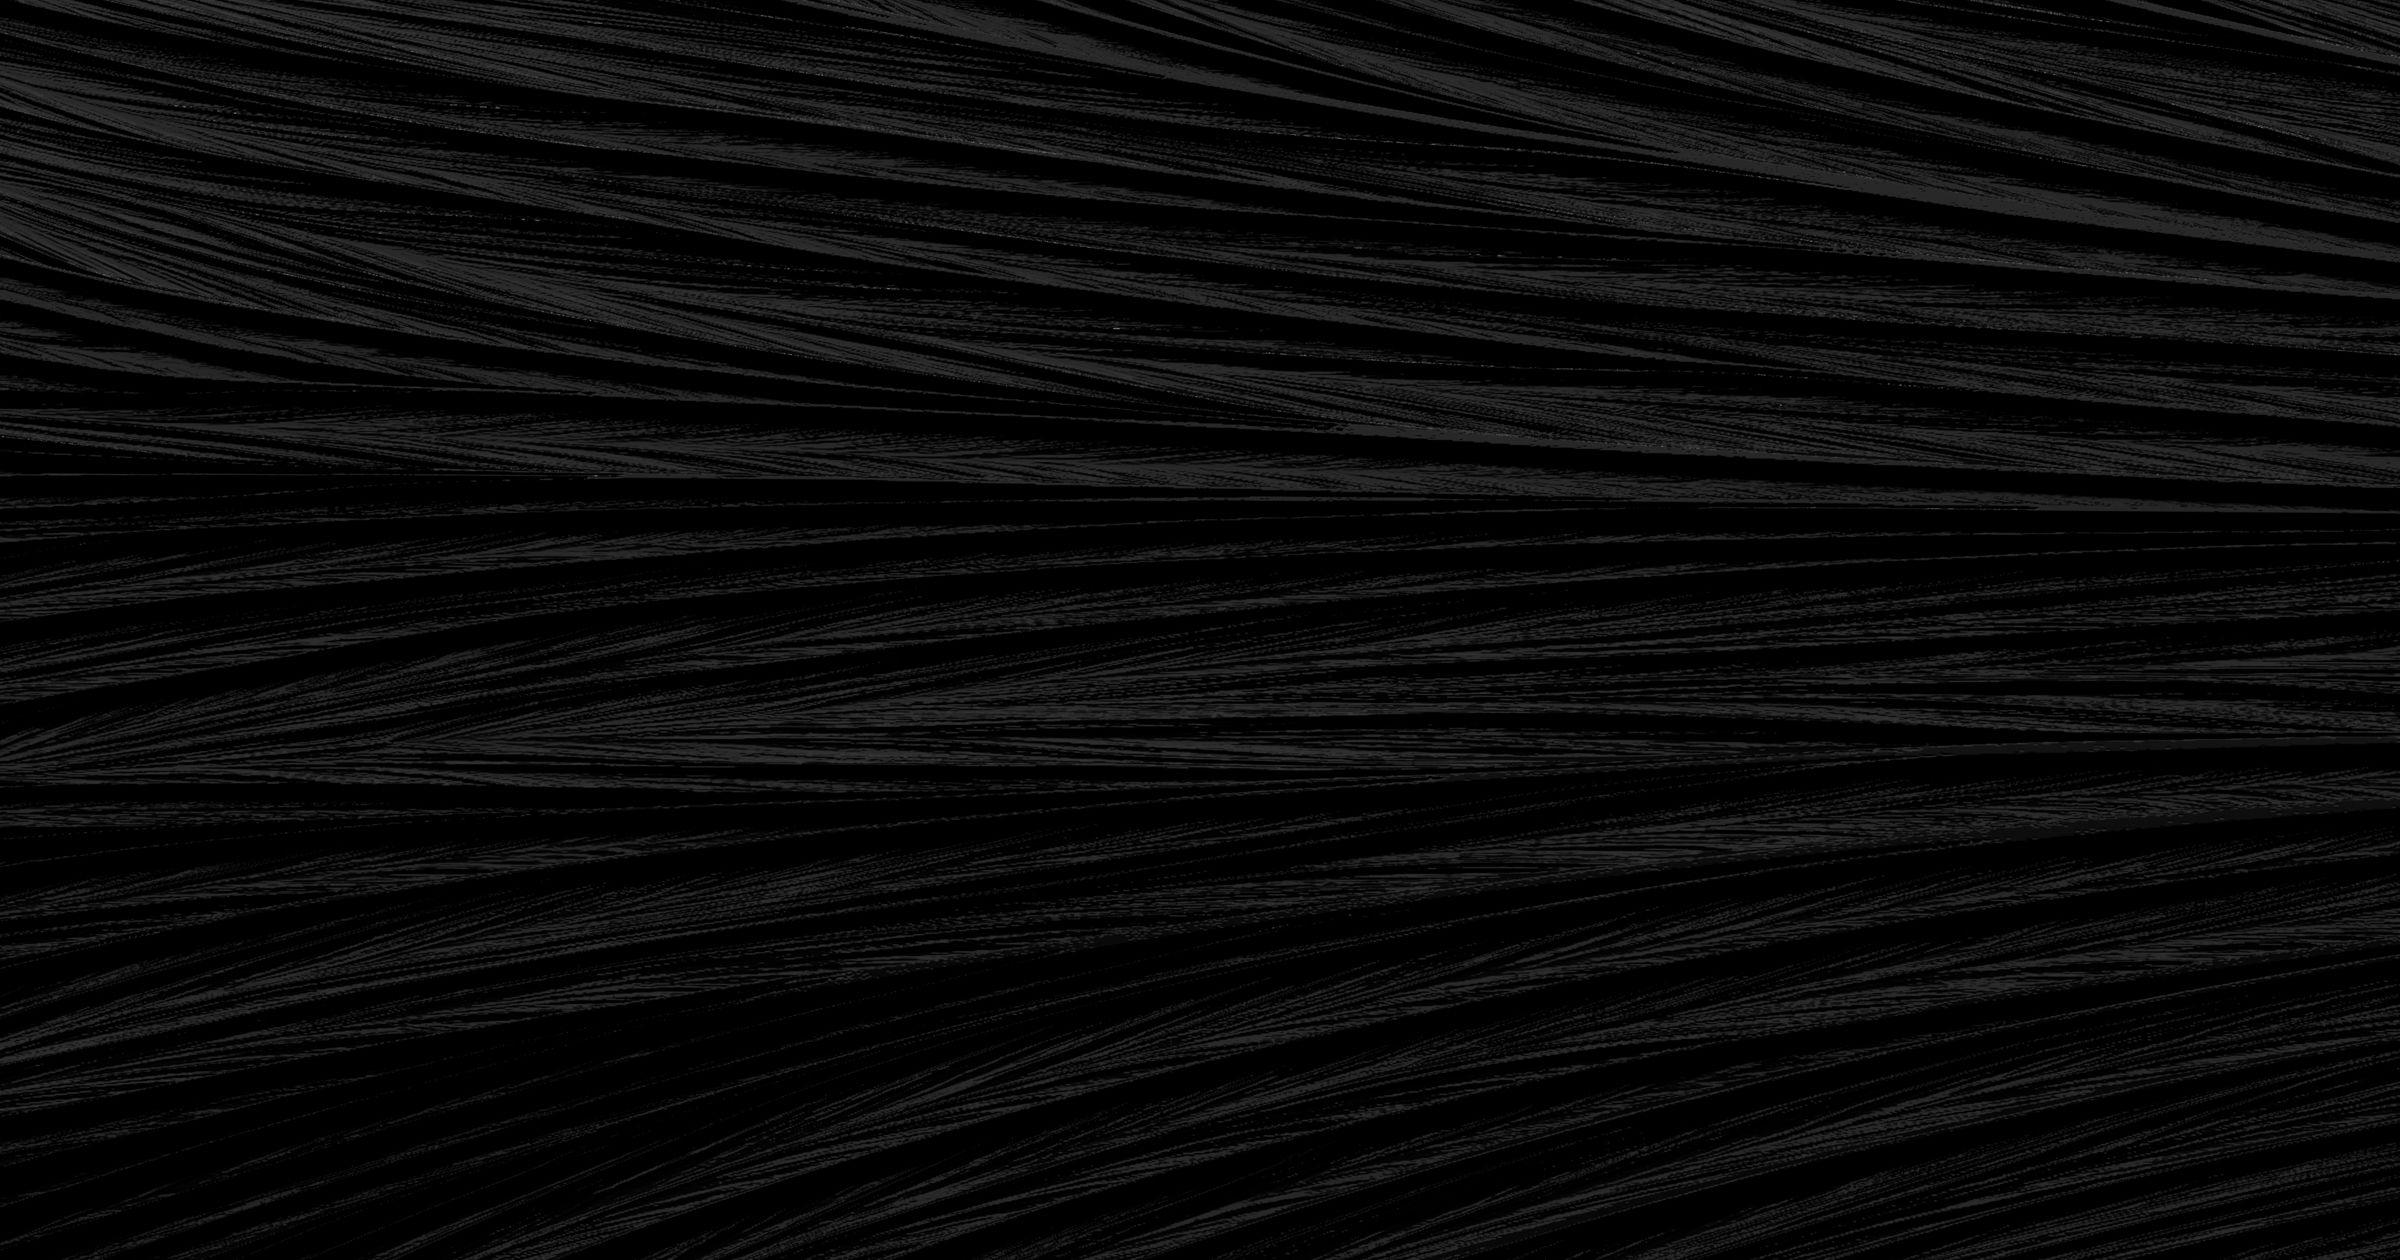 dd833e9b1dc black series by jean marc denis